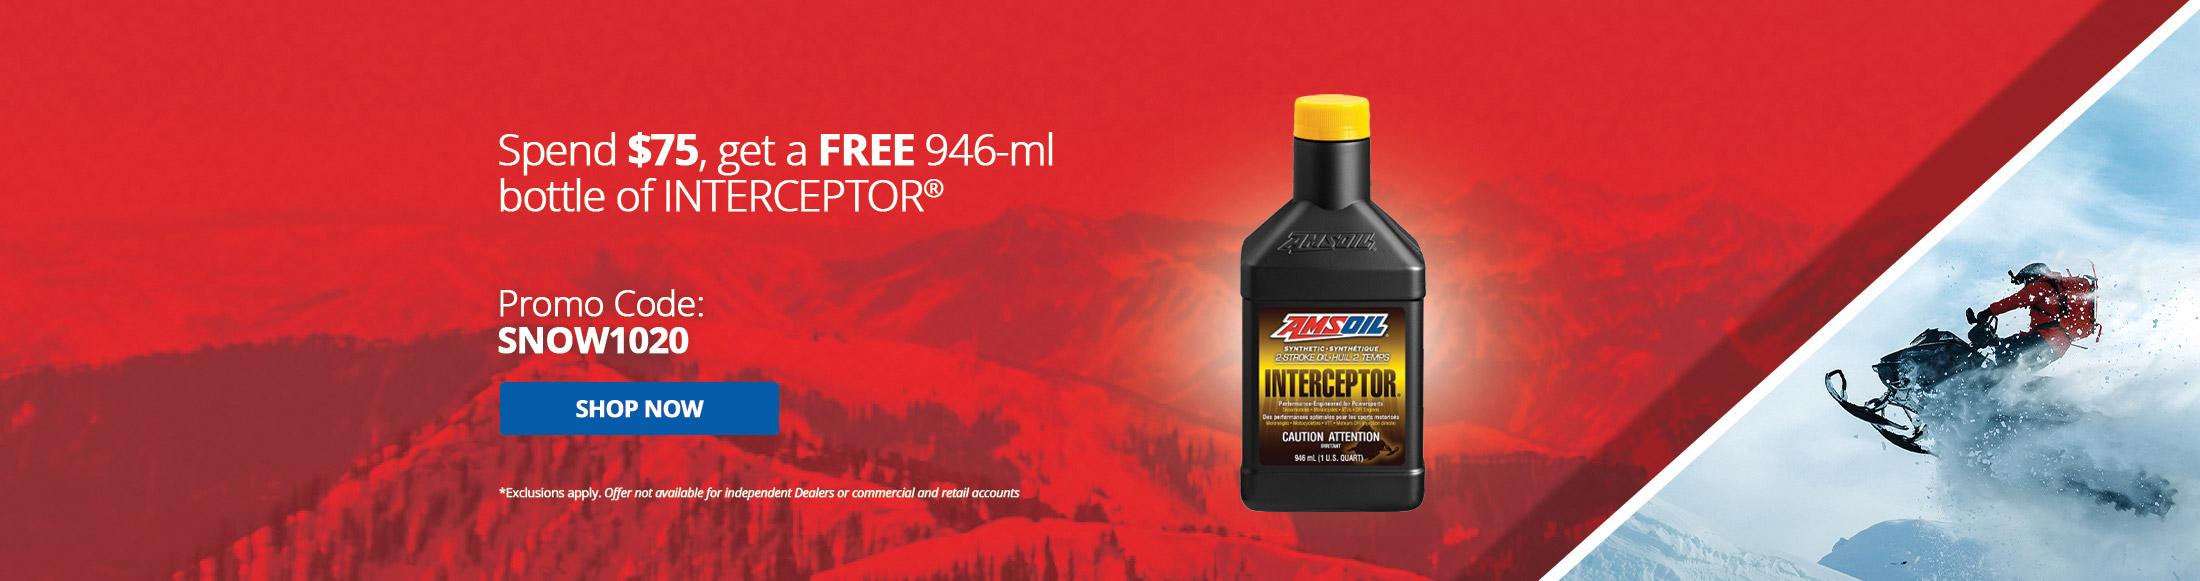 Spend $75 Get a Free 946-ml bottle of Interceptor